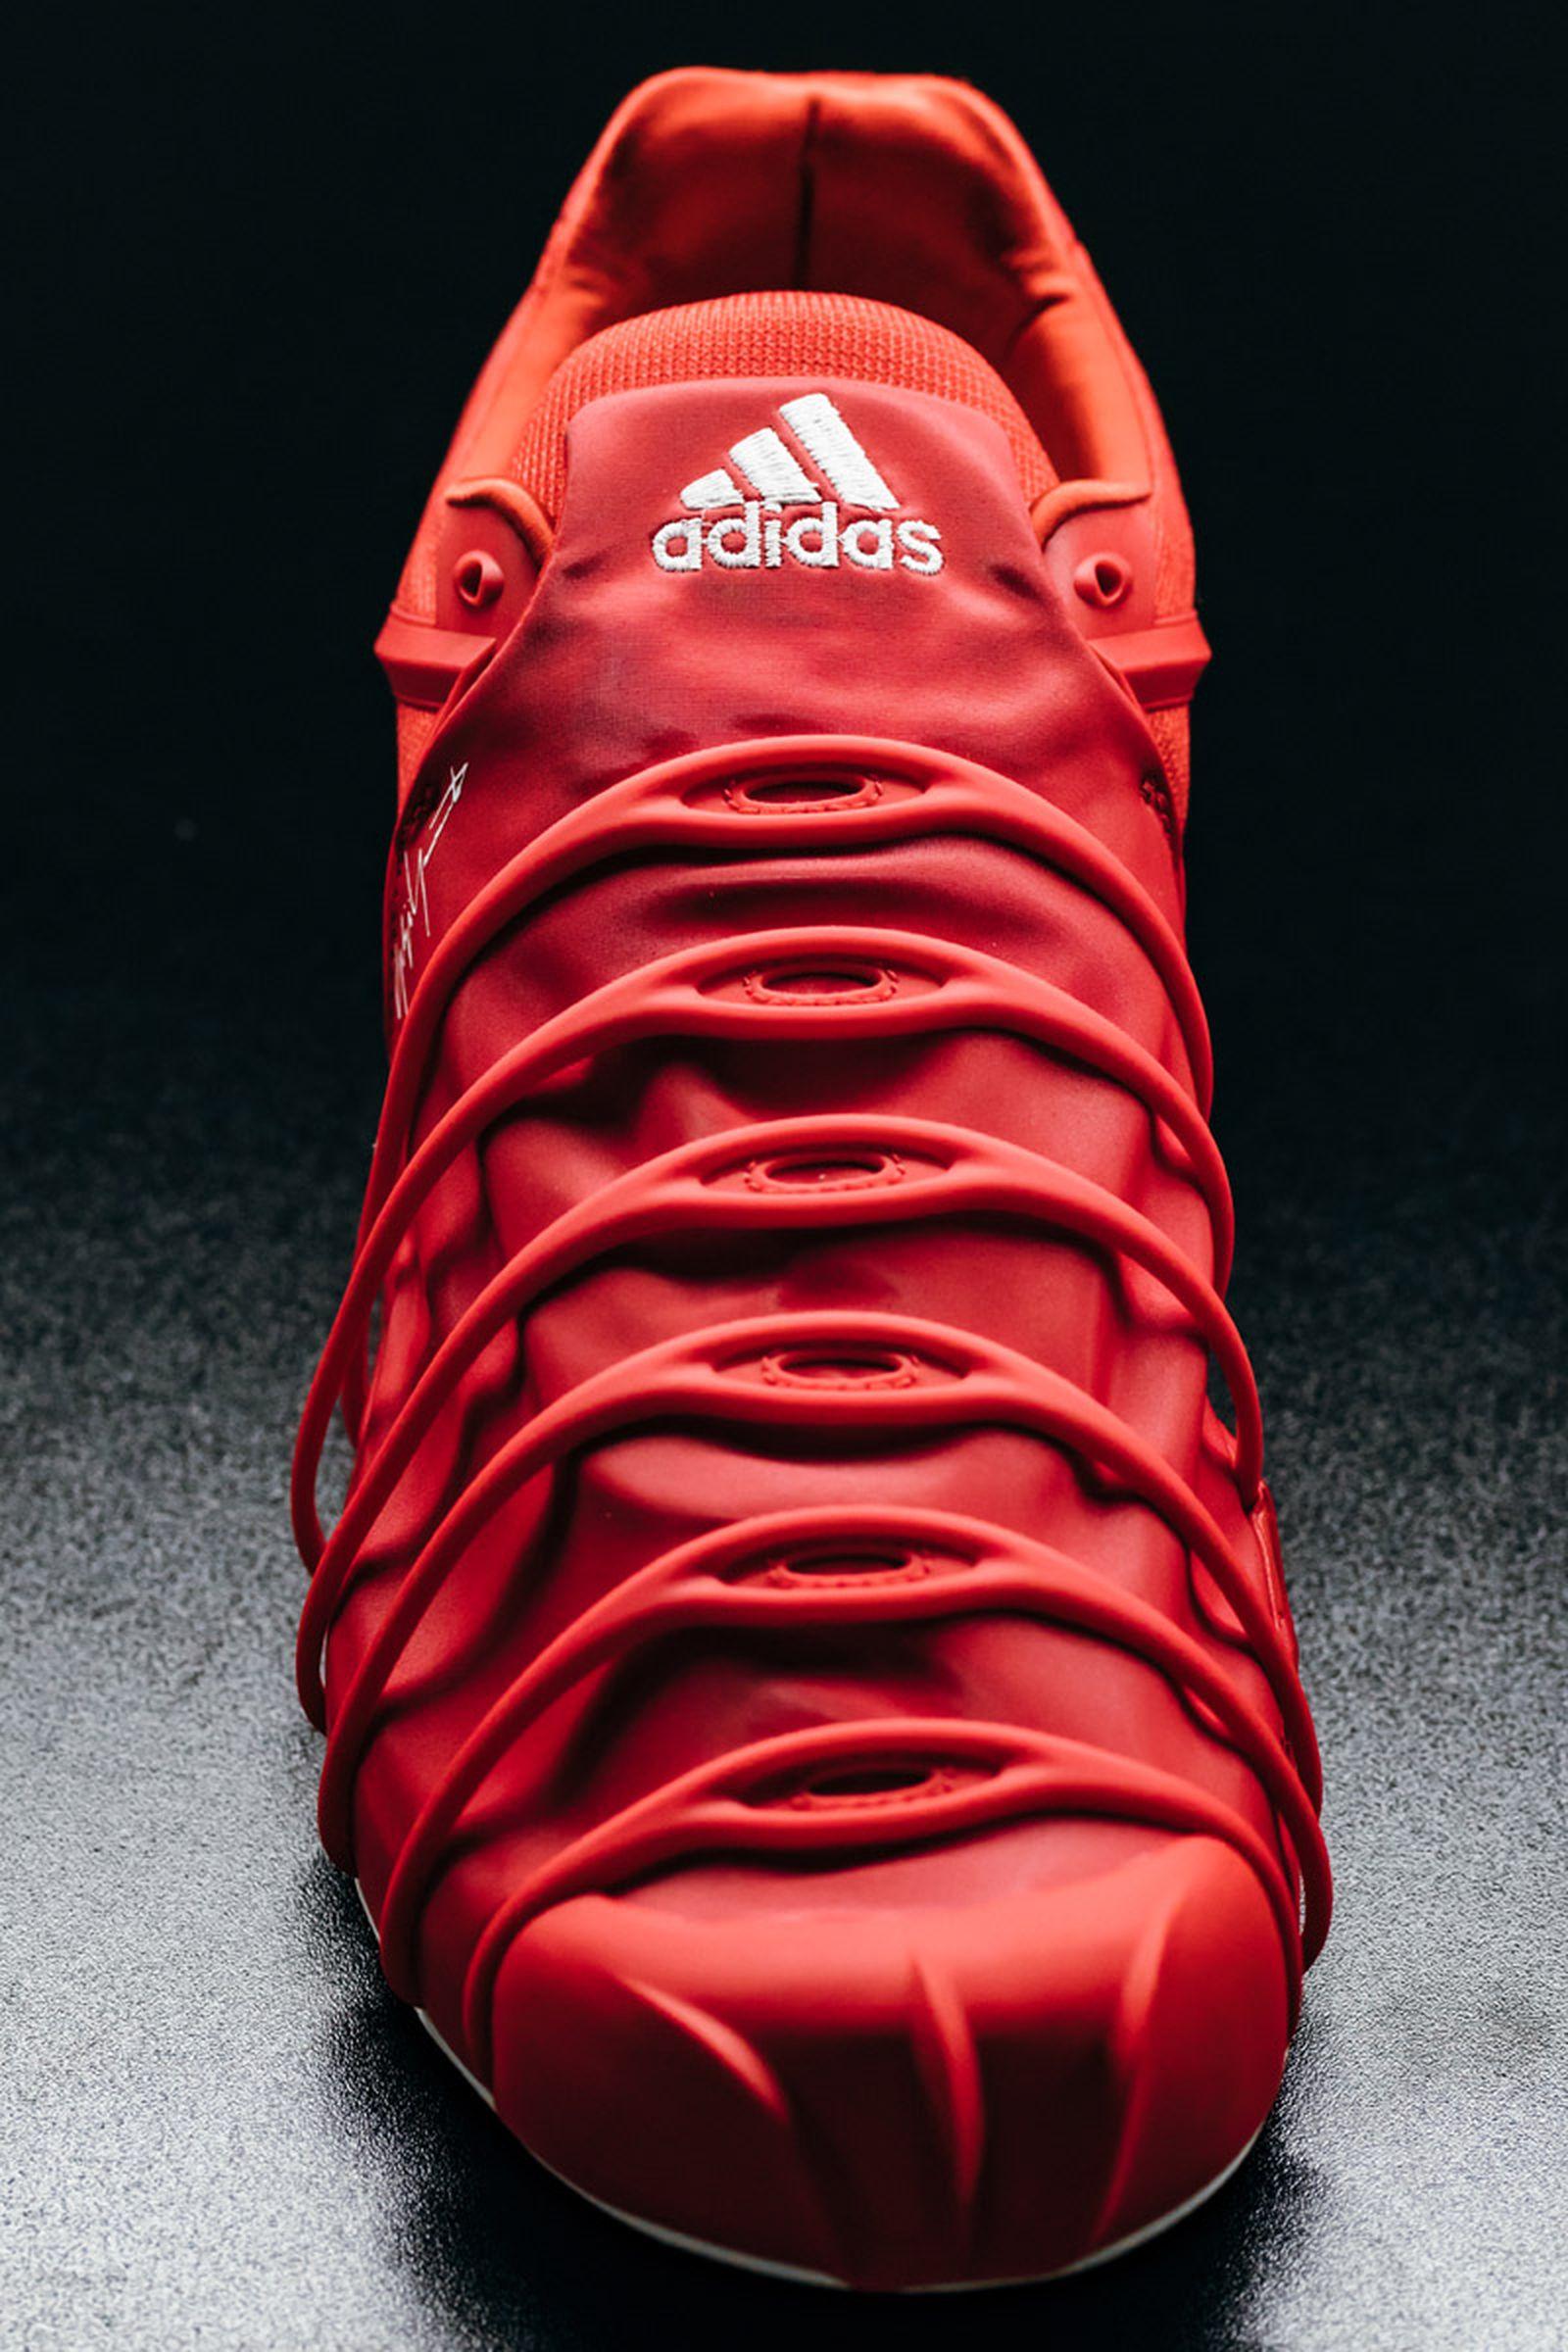 y3 pfw fw19 sneakers Adidas Nic Galway y-3